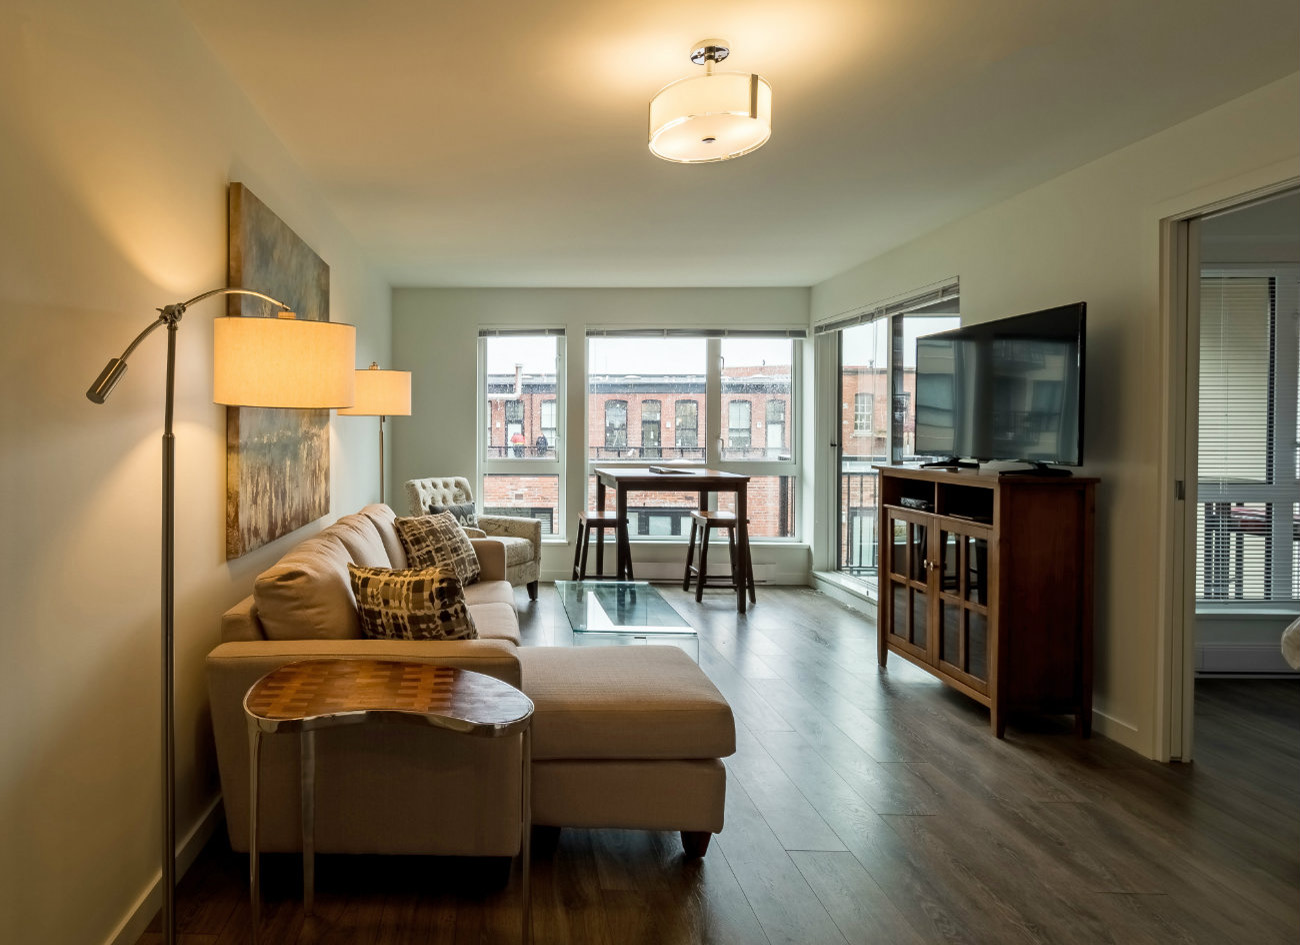 Union modern suites open concept living room